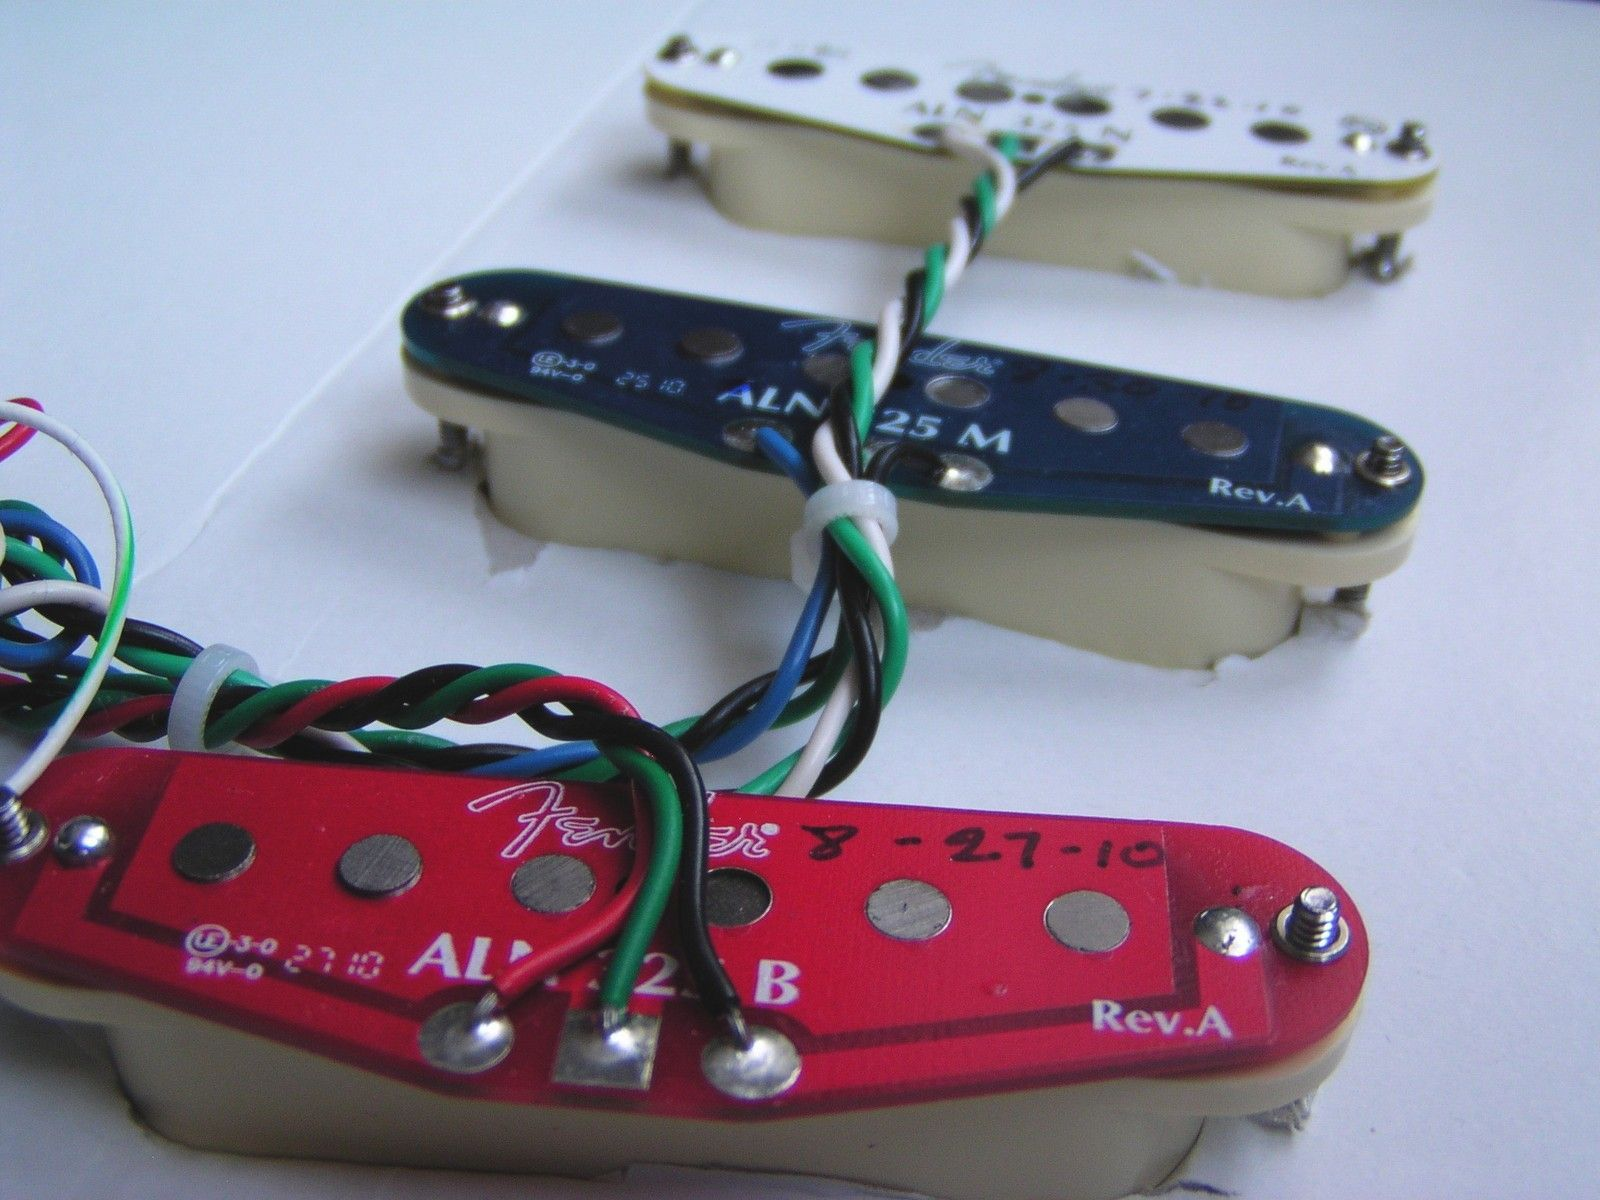 Fender Hot Noiseless Pickup Wiring Diagram Solutions Pickups Arbortech Us